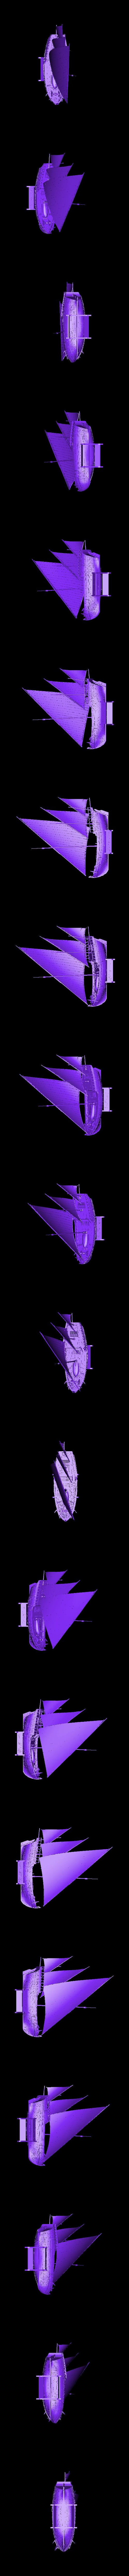 caravel_Nina_joined.stl Download free STL file Columbus caravel Nina (1492) • 3D printer template, tomast